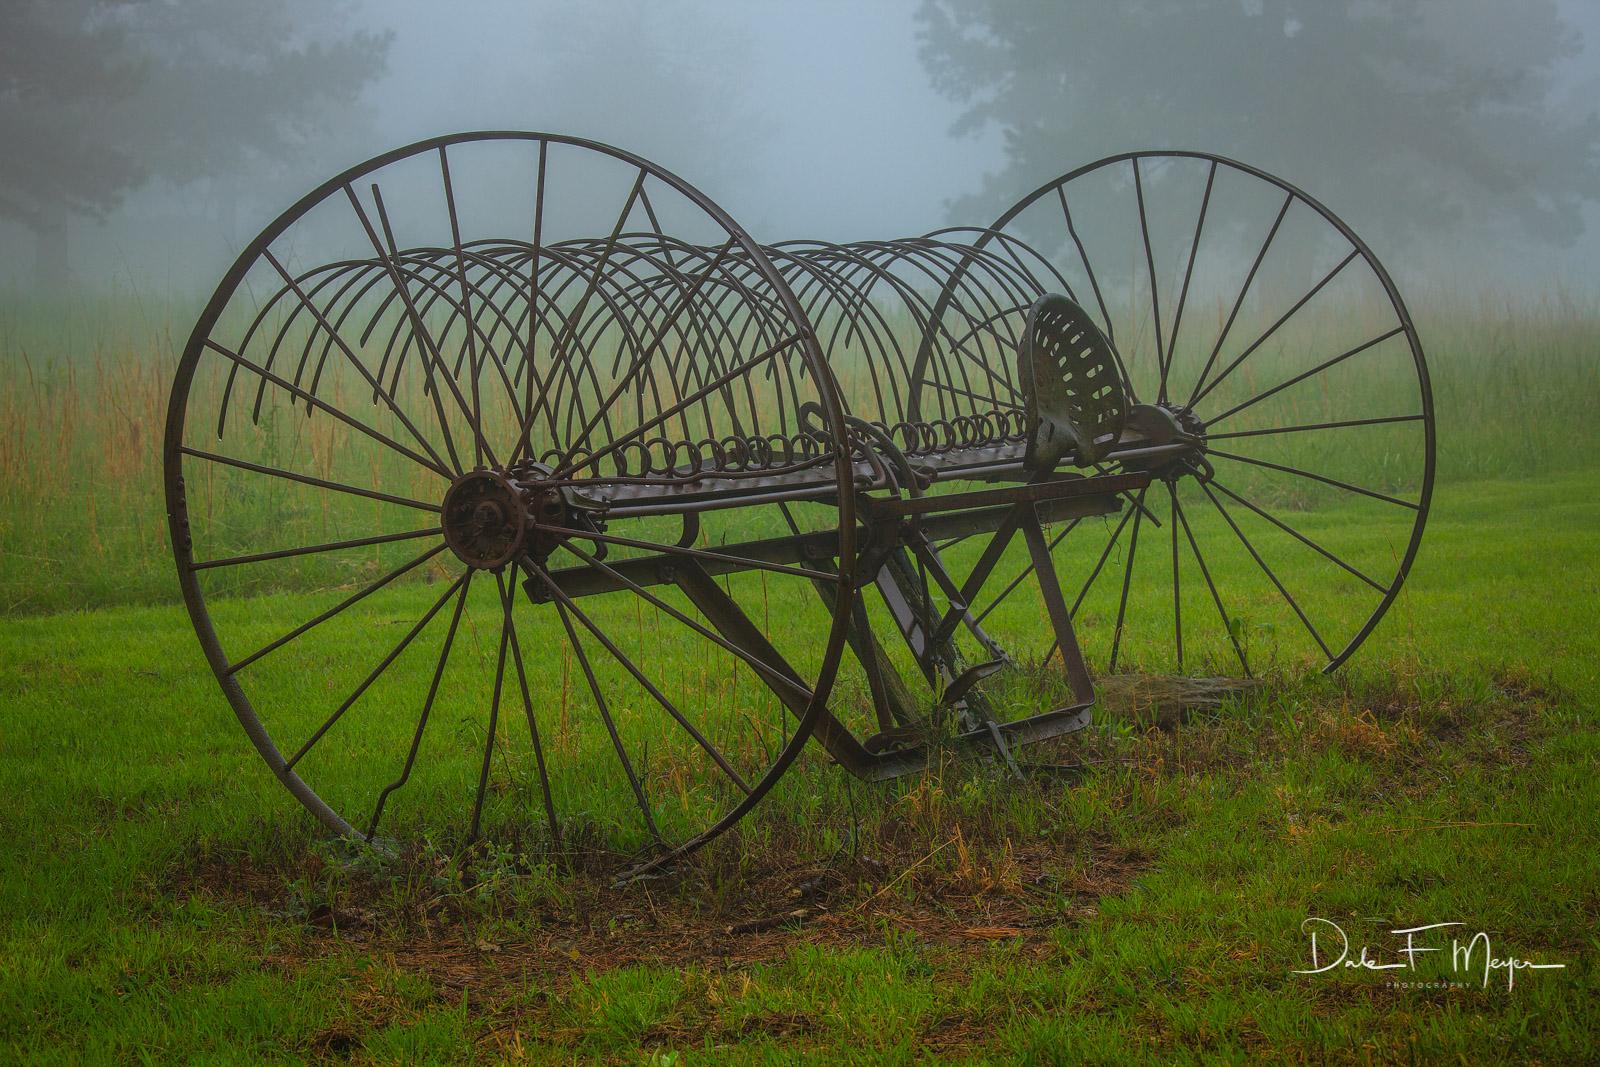 Old horse drawn hay rake,fog,spring 2011, photo